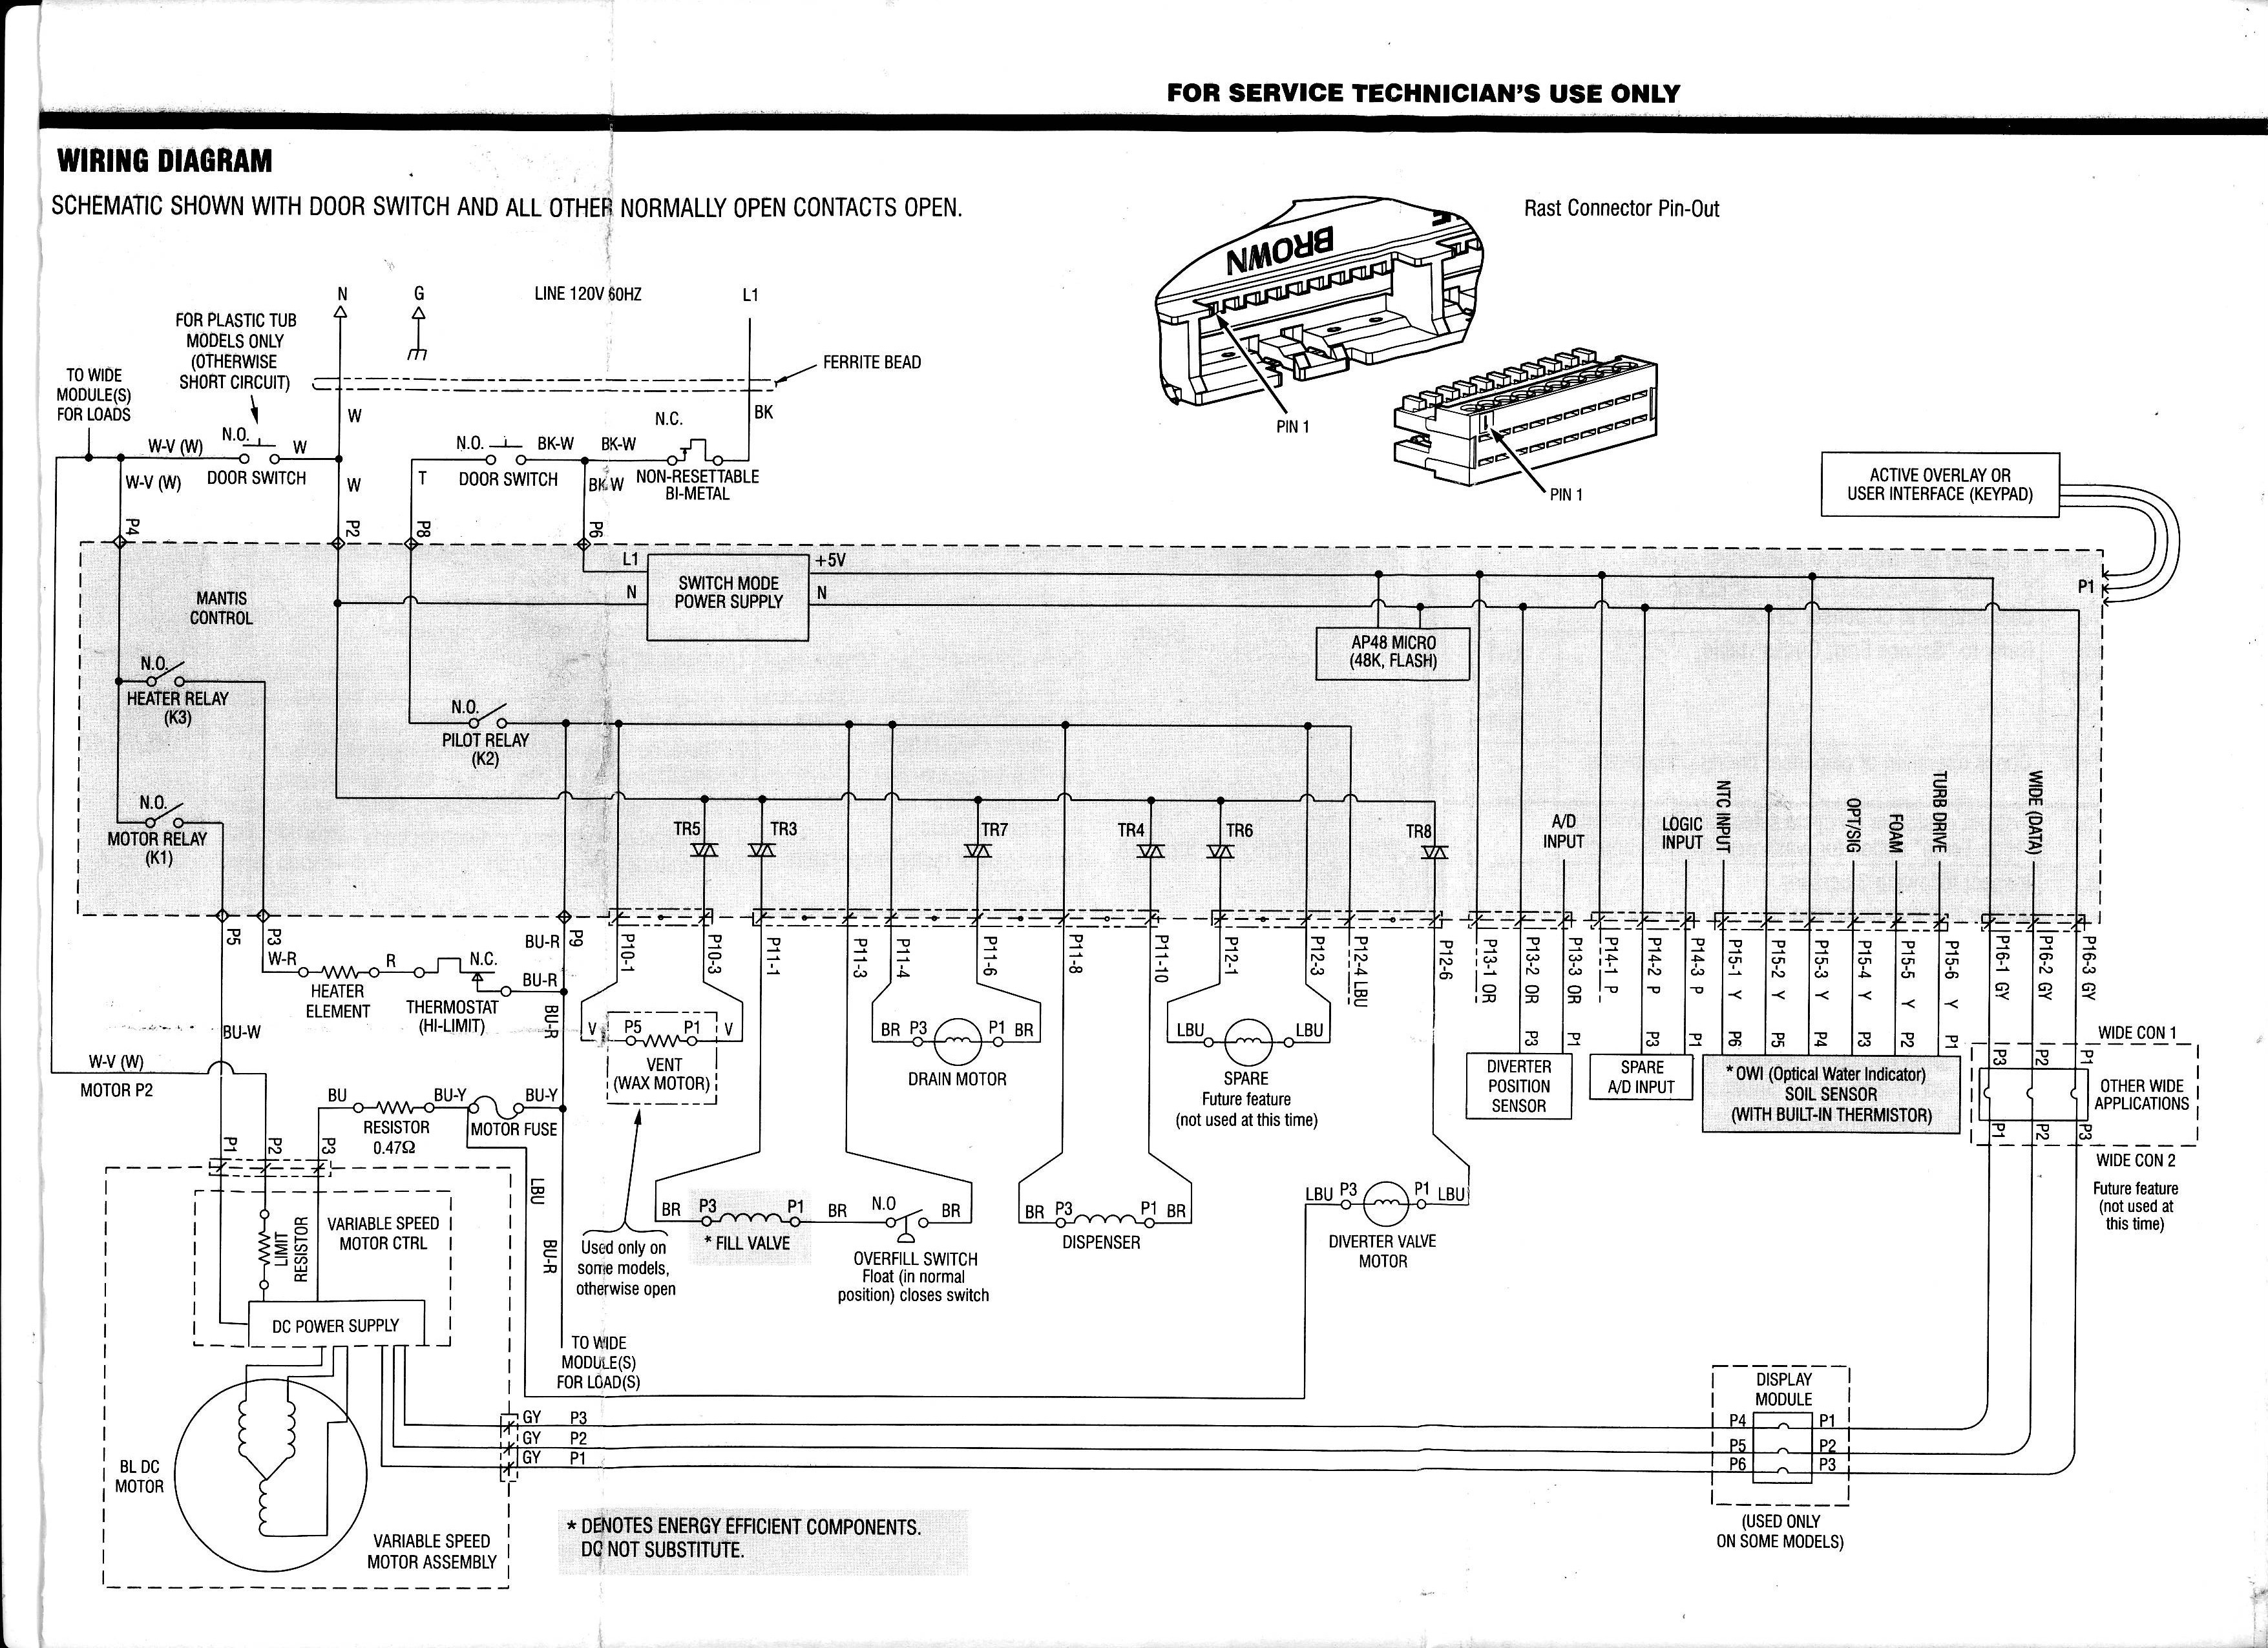 Kenmore Elite Washer Wiring Diagram Virtual Fretboard 3955735 Model 11023032100 Dryer Oasis Best